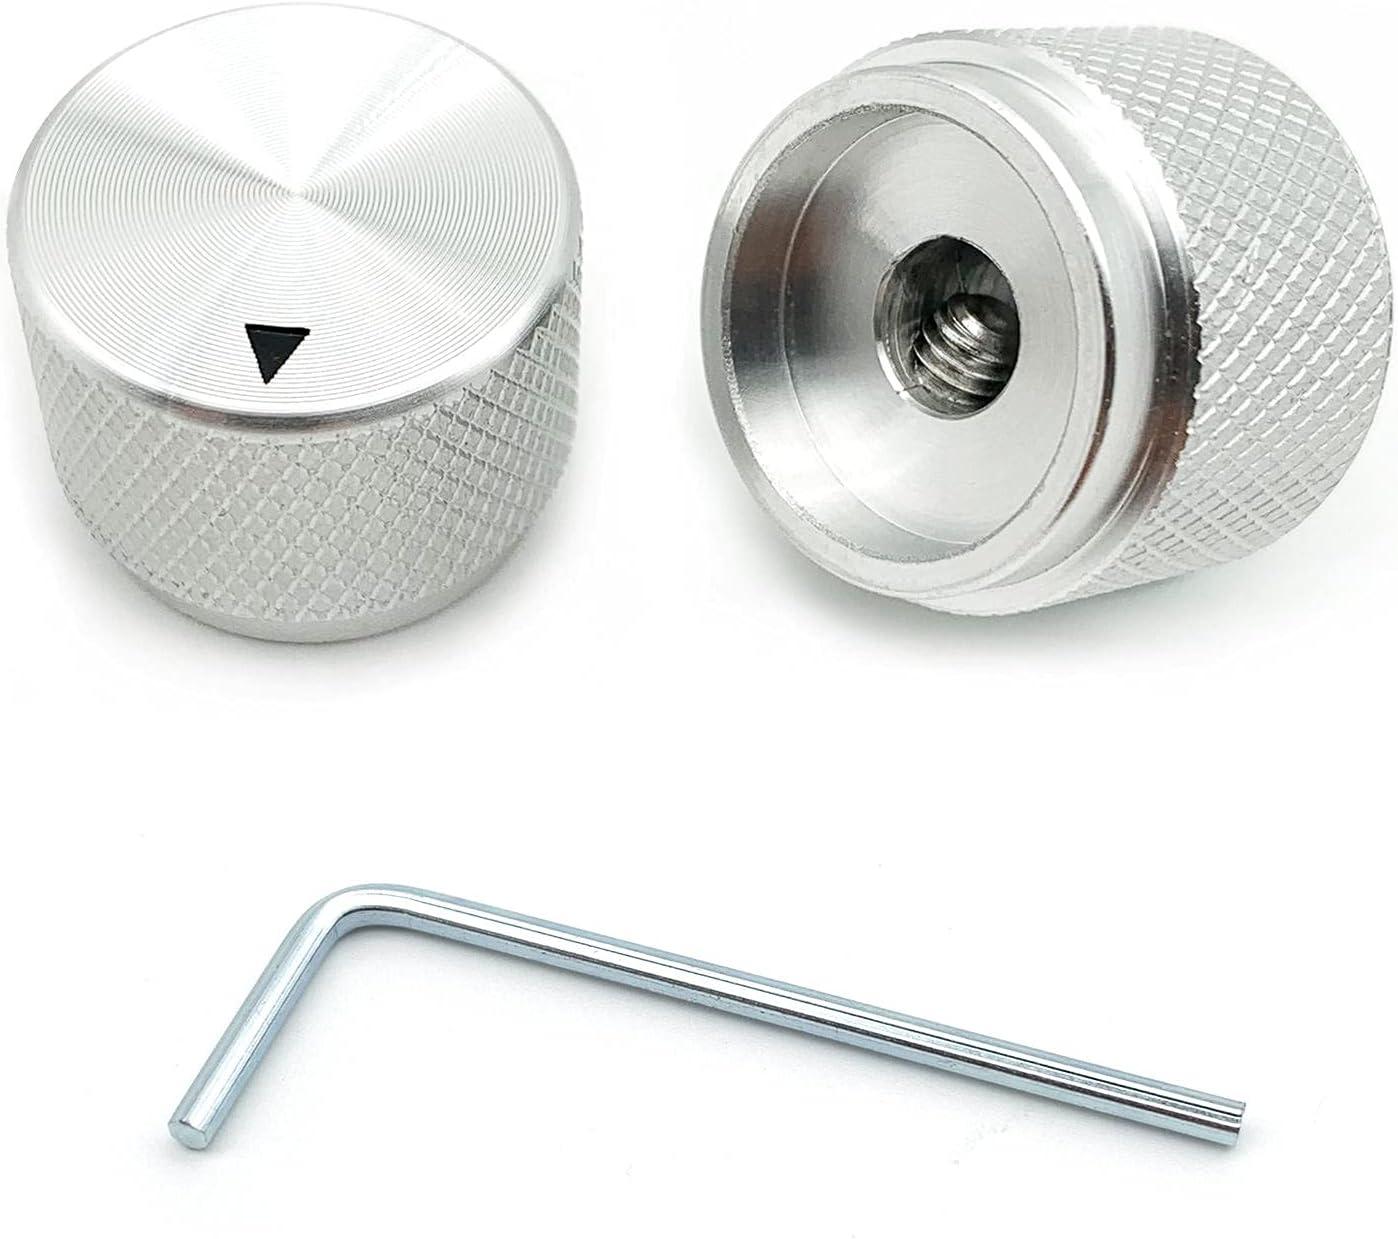 Aluminum Max 53% OFF Electronic Guitar Potentiometer Overseas parallel import regular item Knob for 6 Diameter mm